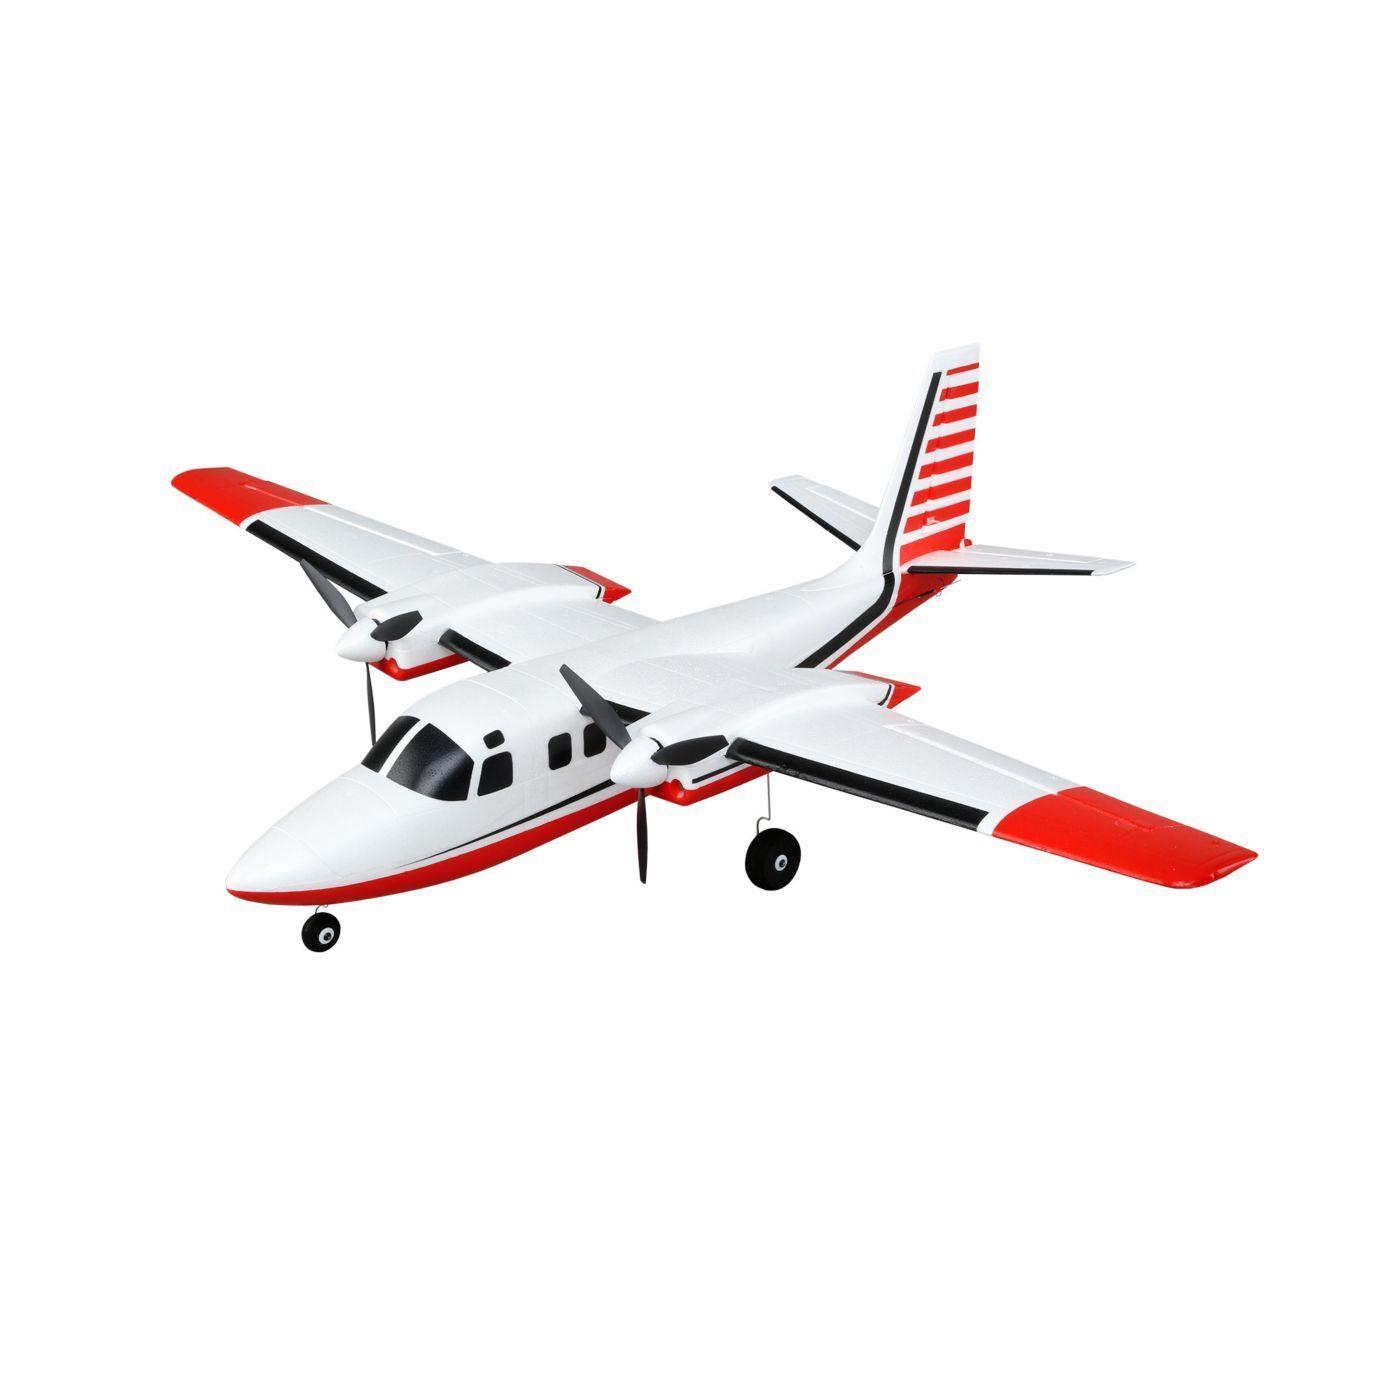 E-Flite UMX Aero Commander BL Brushless Bind And Fly Basic R C Airplane EFLU5850